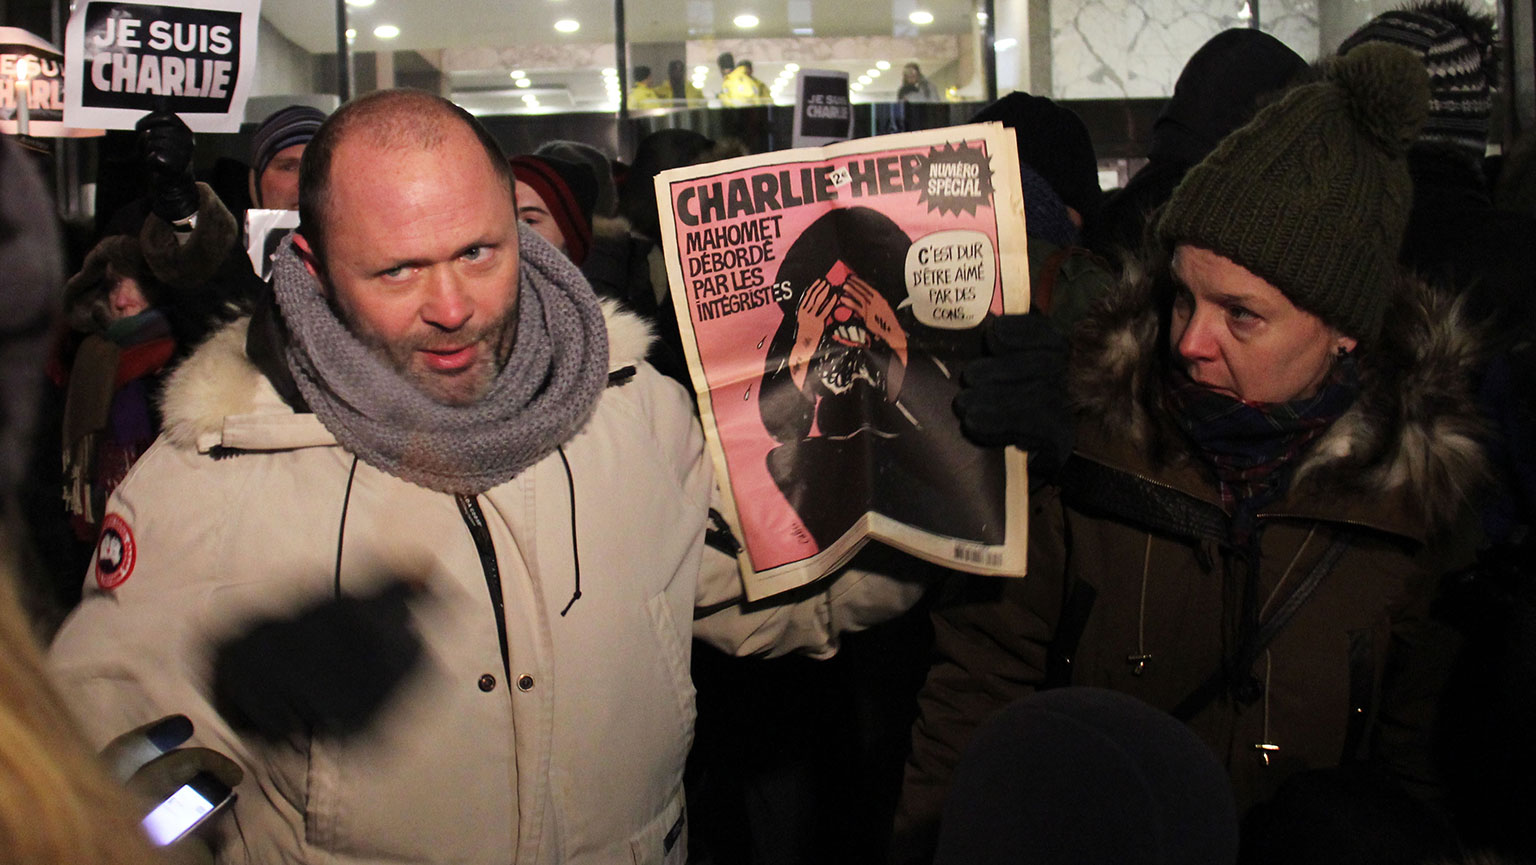 Photograph of Toronto's Charlie Hebdo vigil by Michael Fraiman